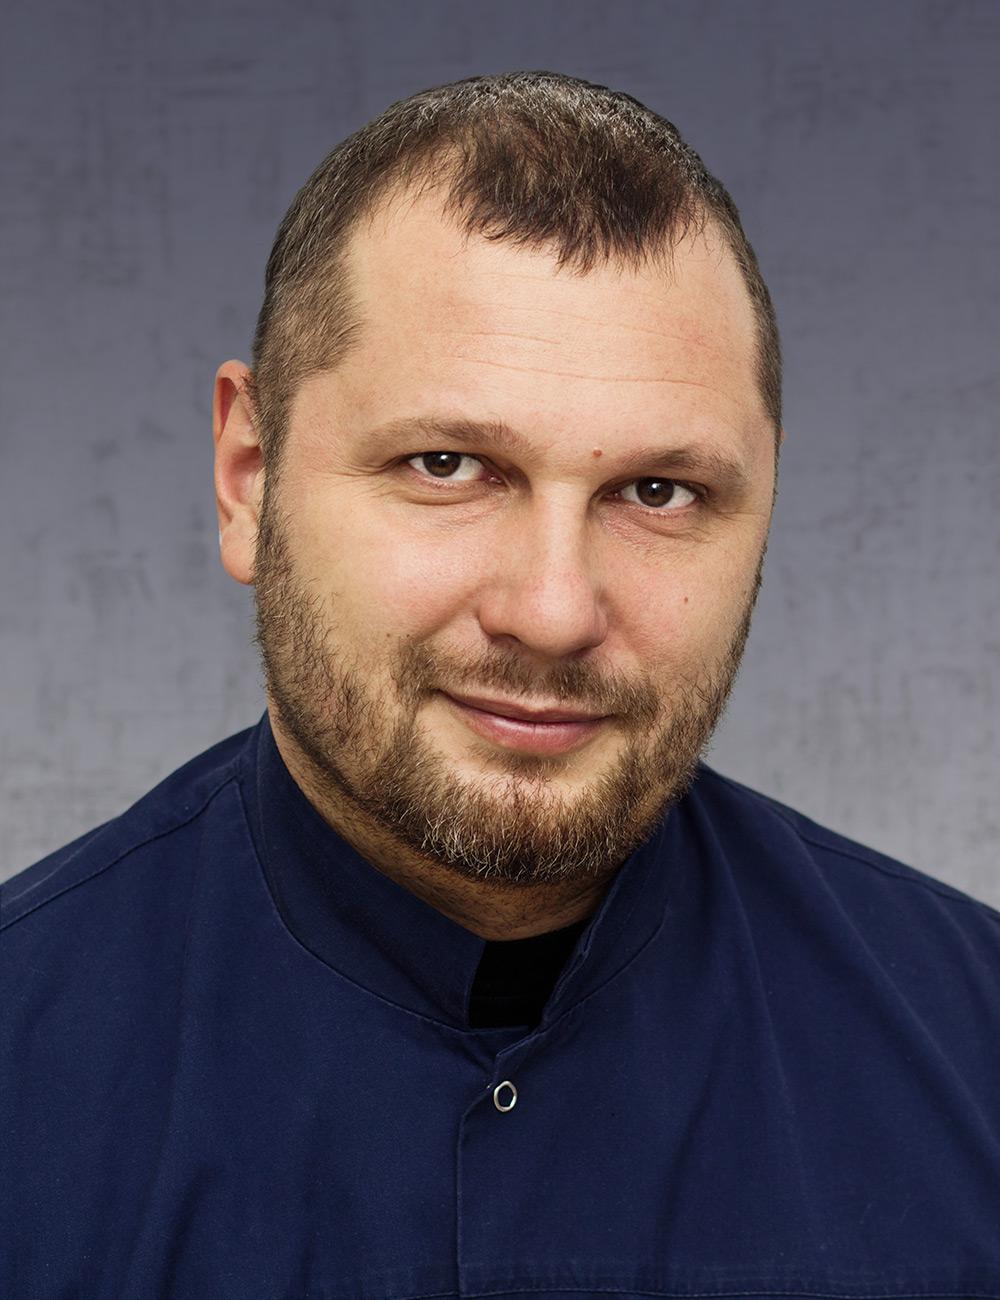 Алексей Ярославович Корытнюк